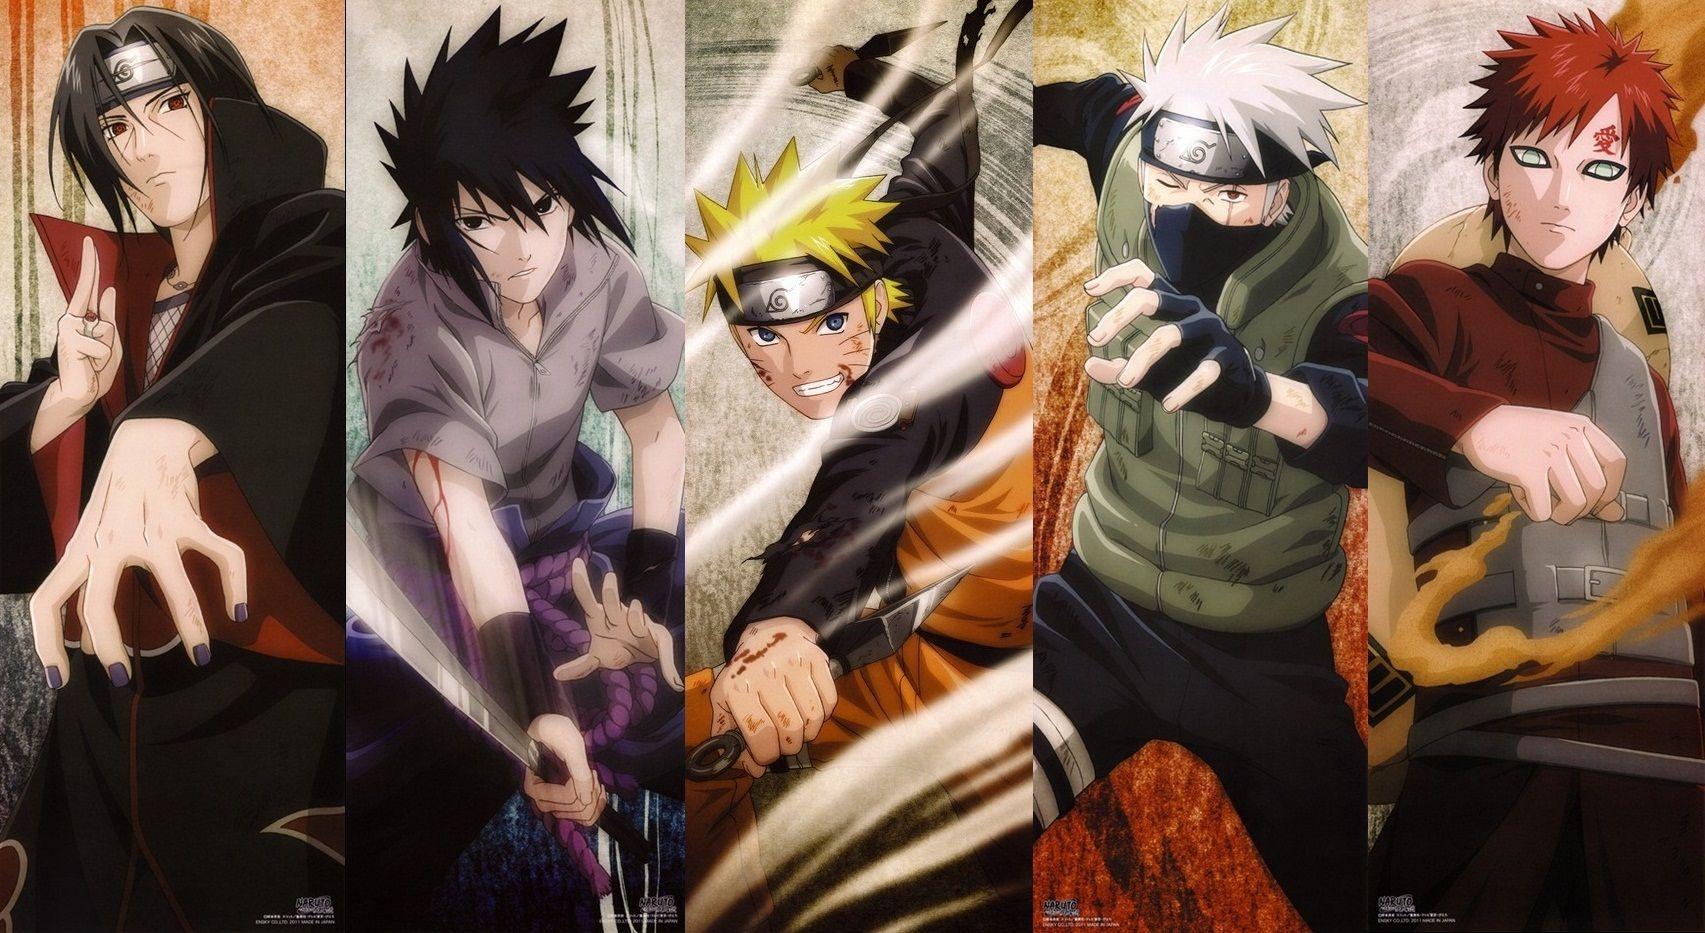 Download Naruto Wallpapers 016